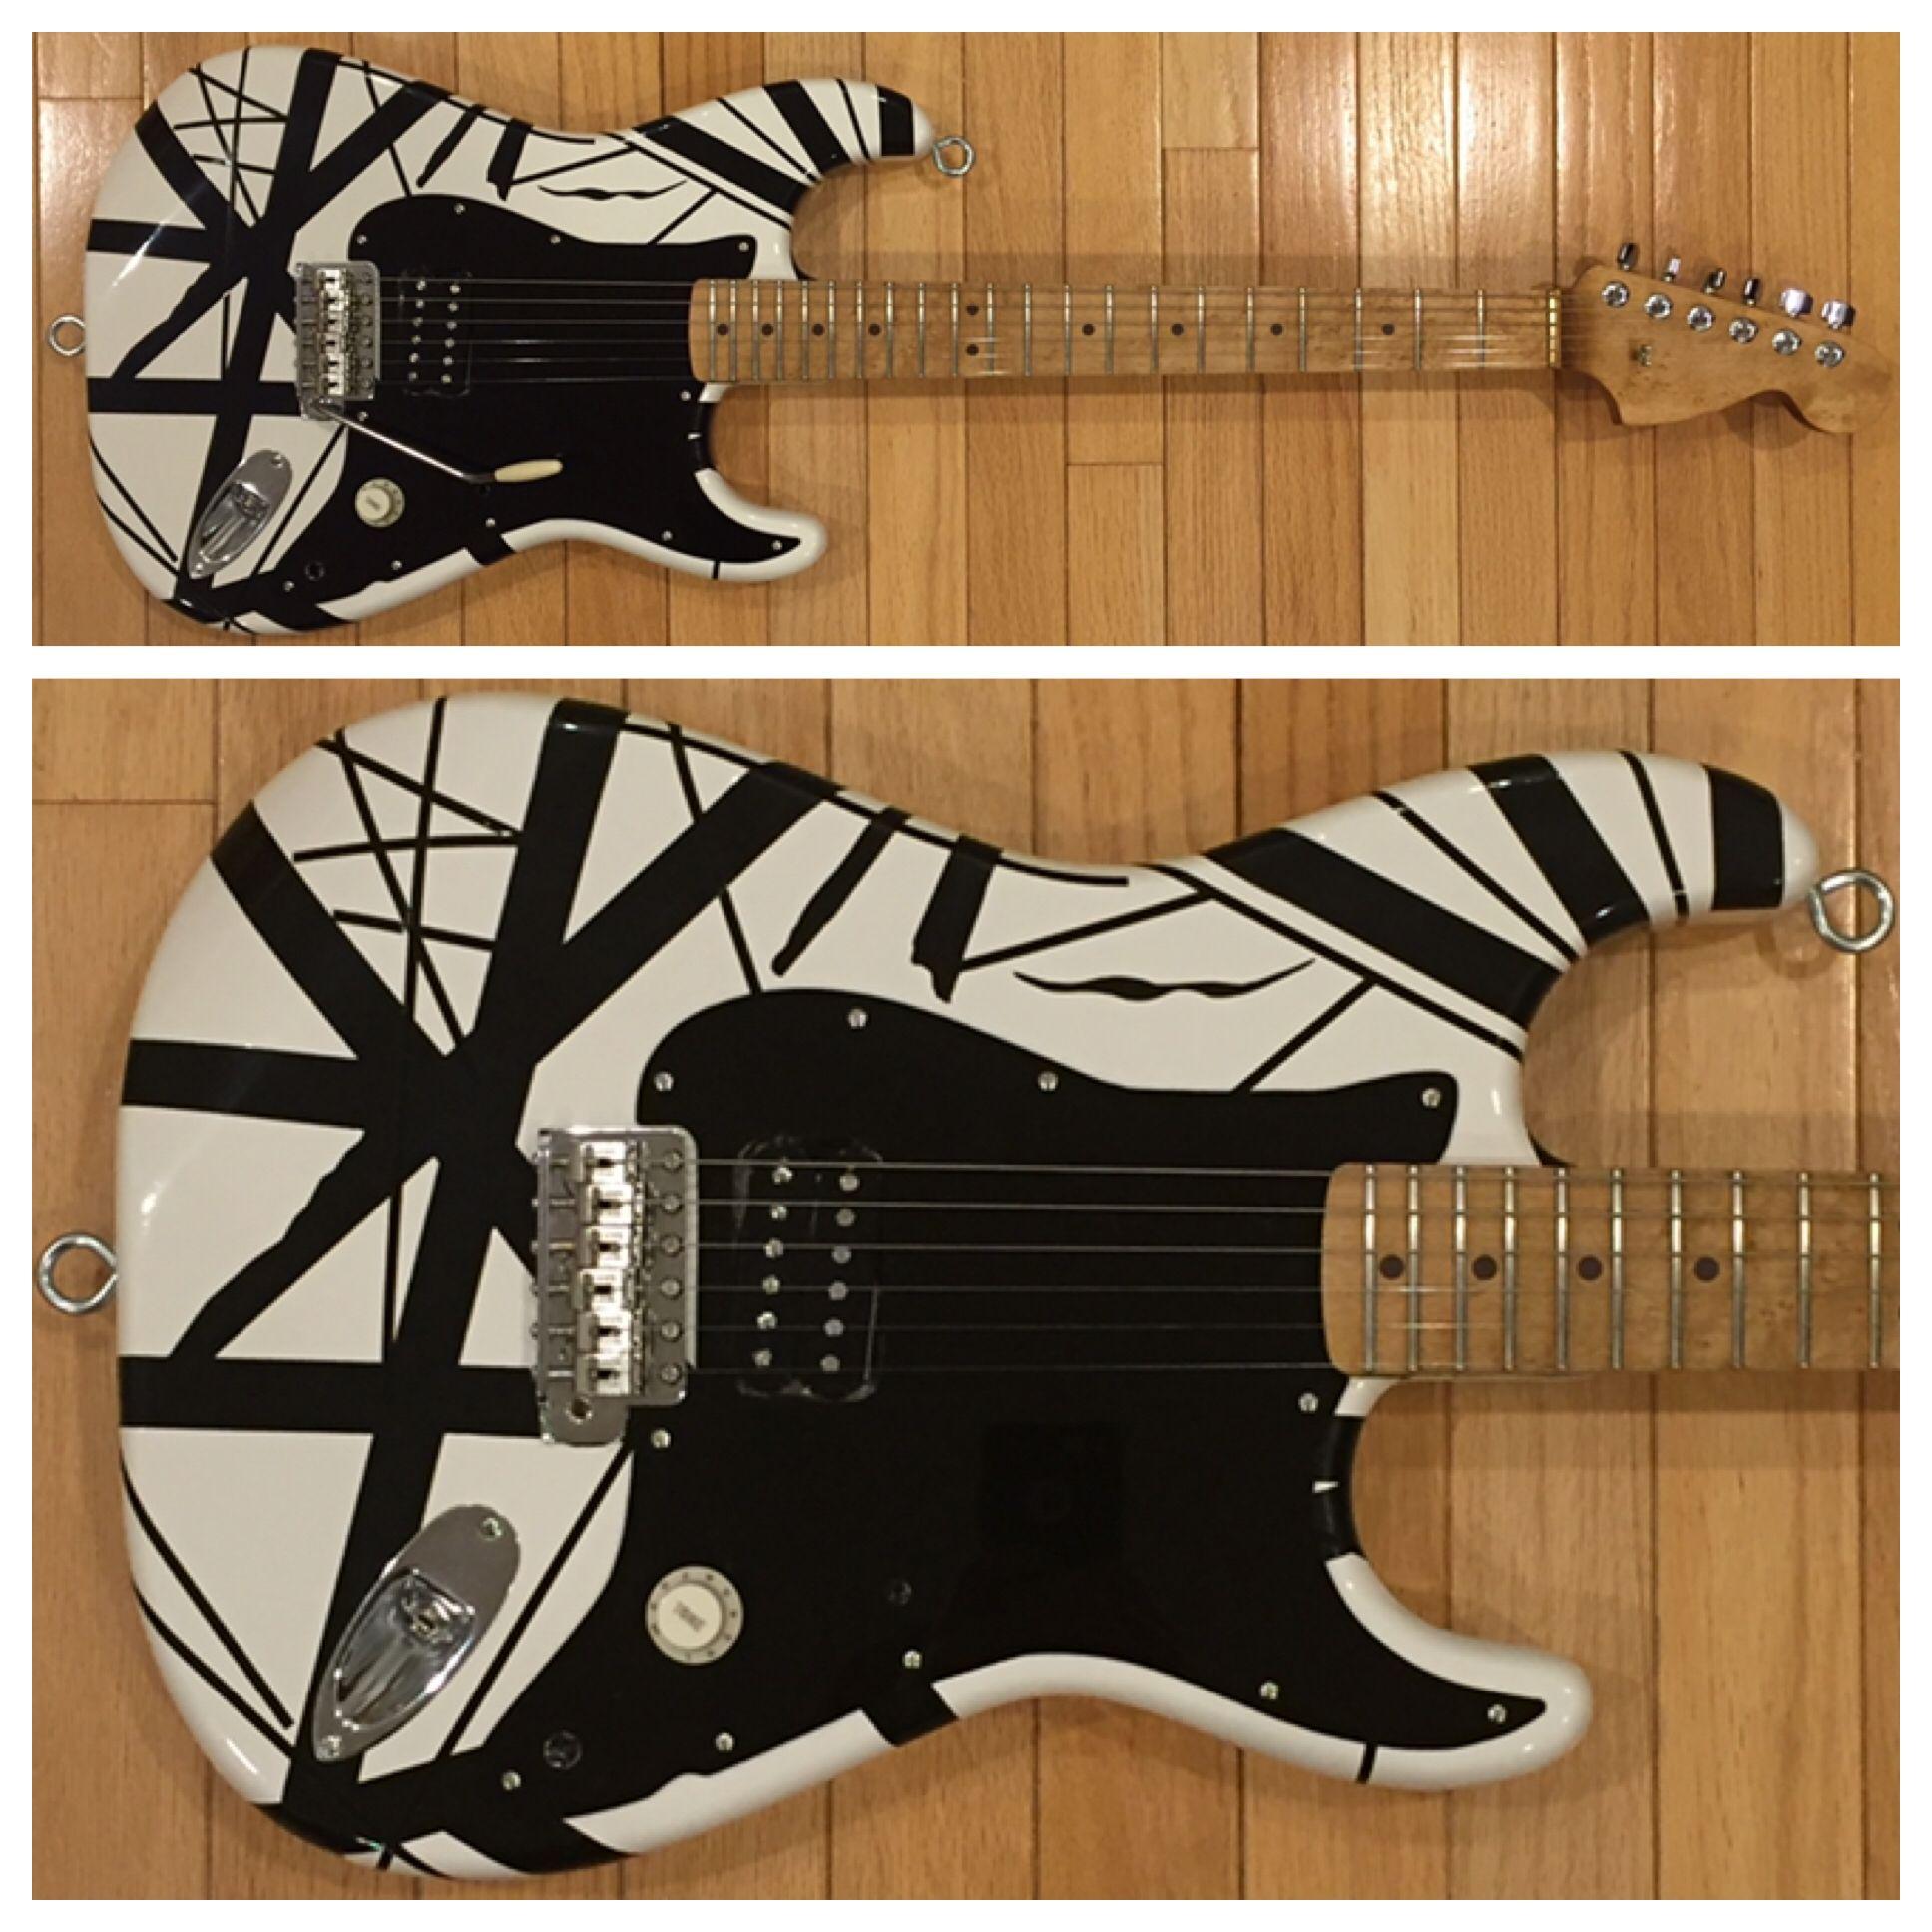 Evh Limited Edition 78 Eruption Electric Guitar Black White Striped Guitar Fender Guitars Guitar Kits